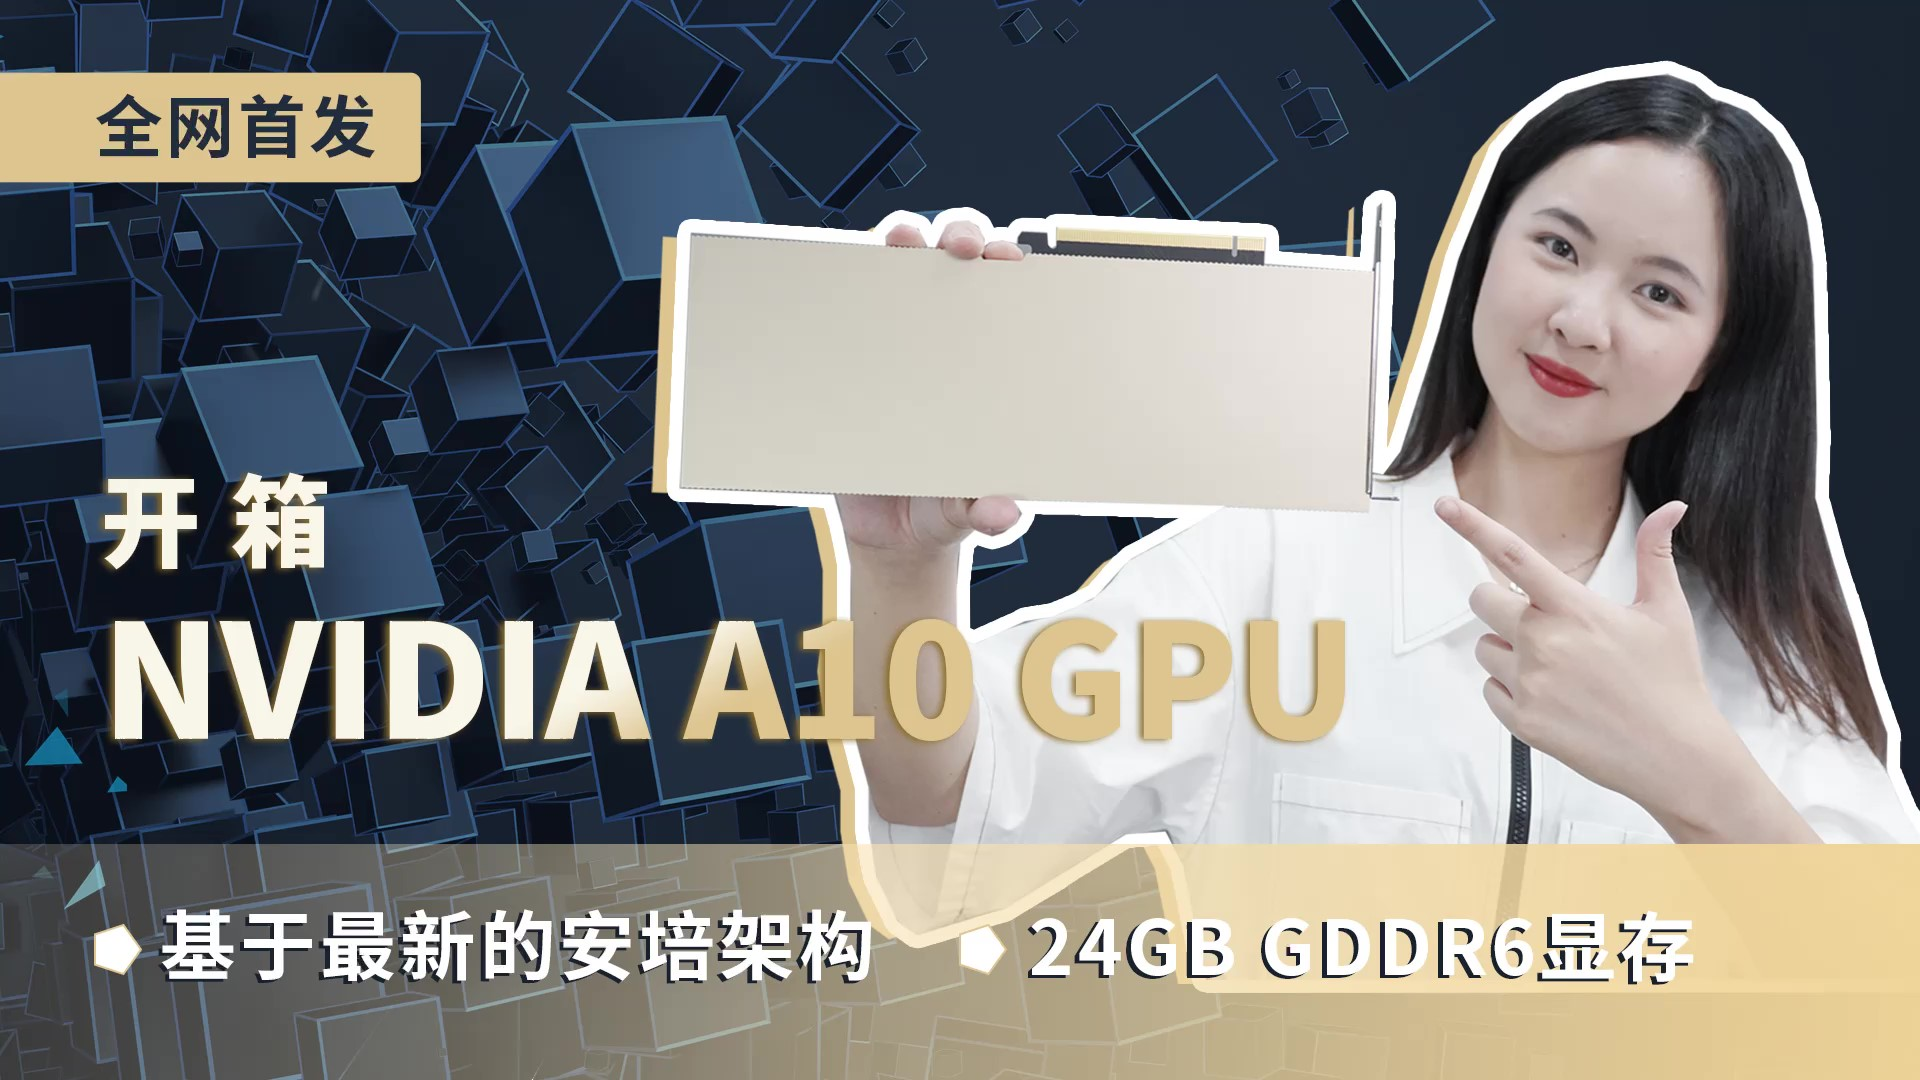 NVIDIA A10 GPU开箱视频